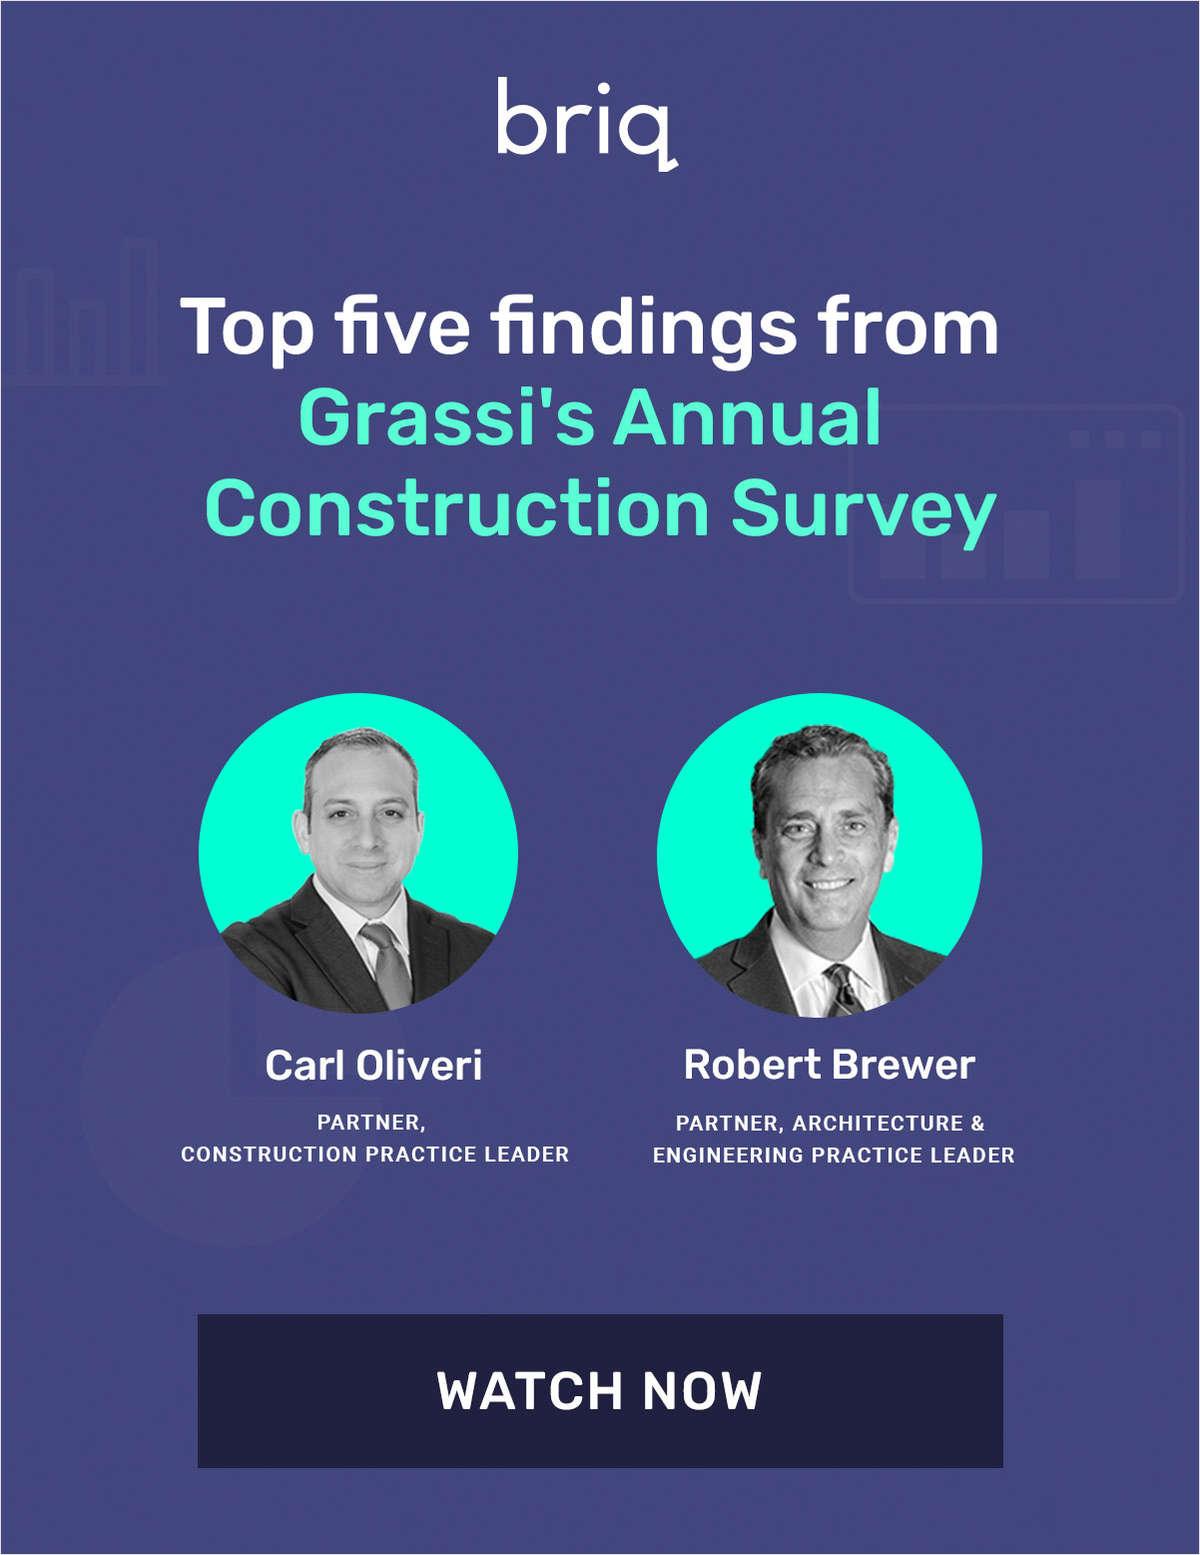 GRASSI's Annual Construction Survey Top 5 Findings [Briq Webinar]